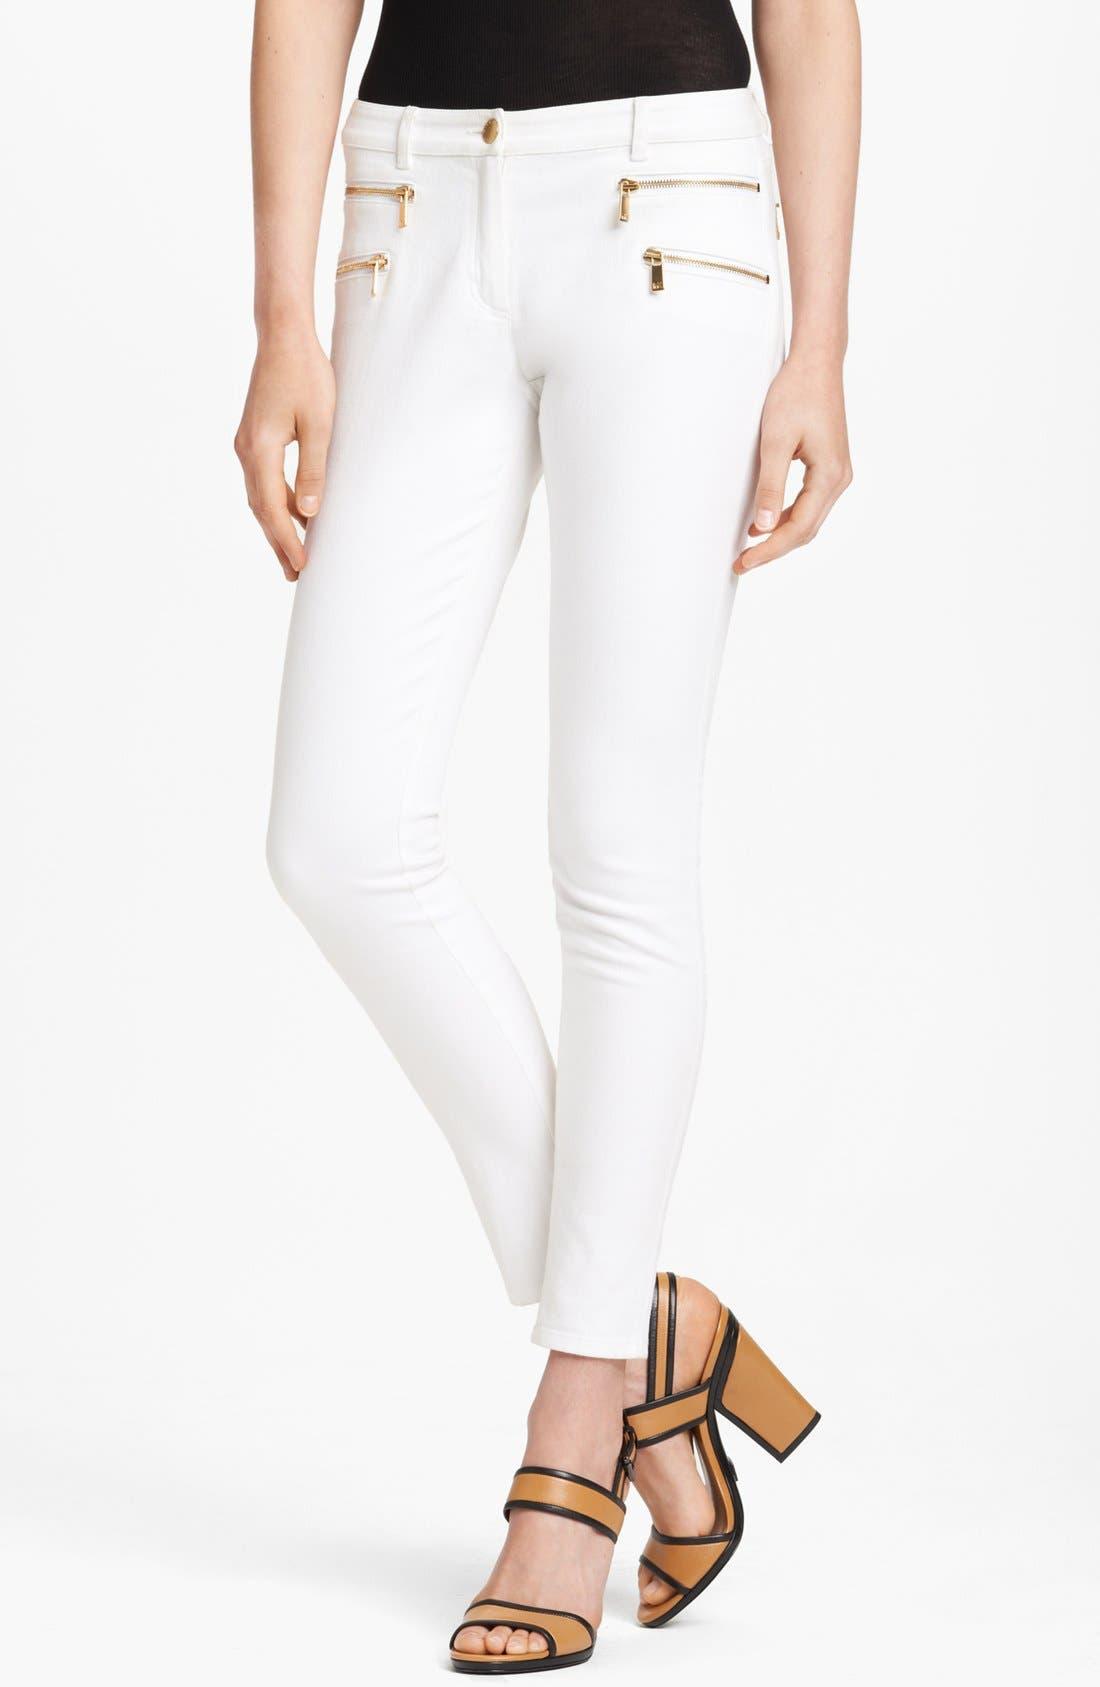 Alternate Image 1 Selected - Michael Kors Skinny Jeans